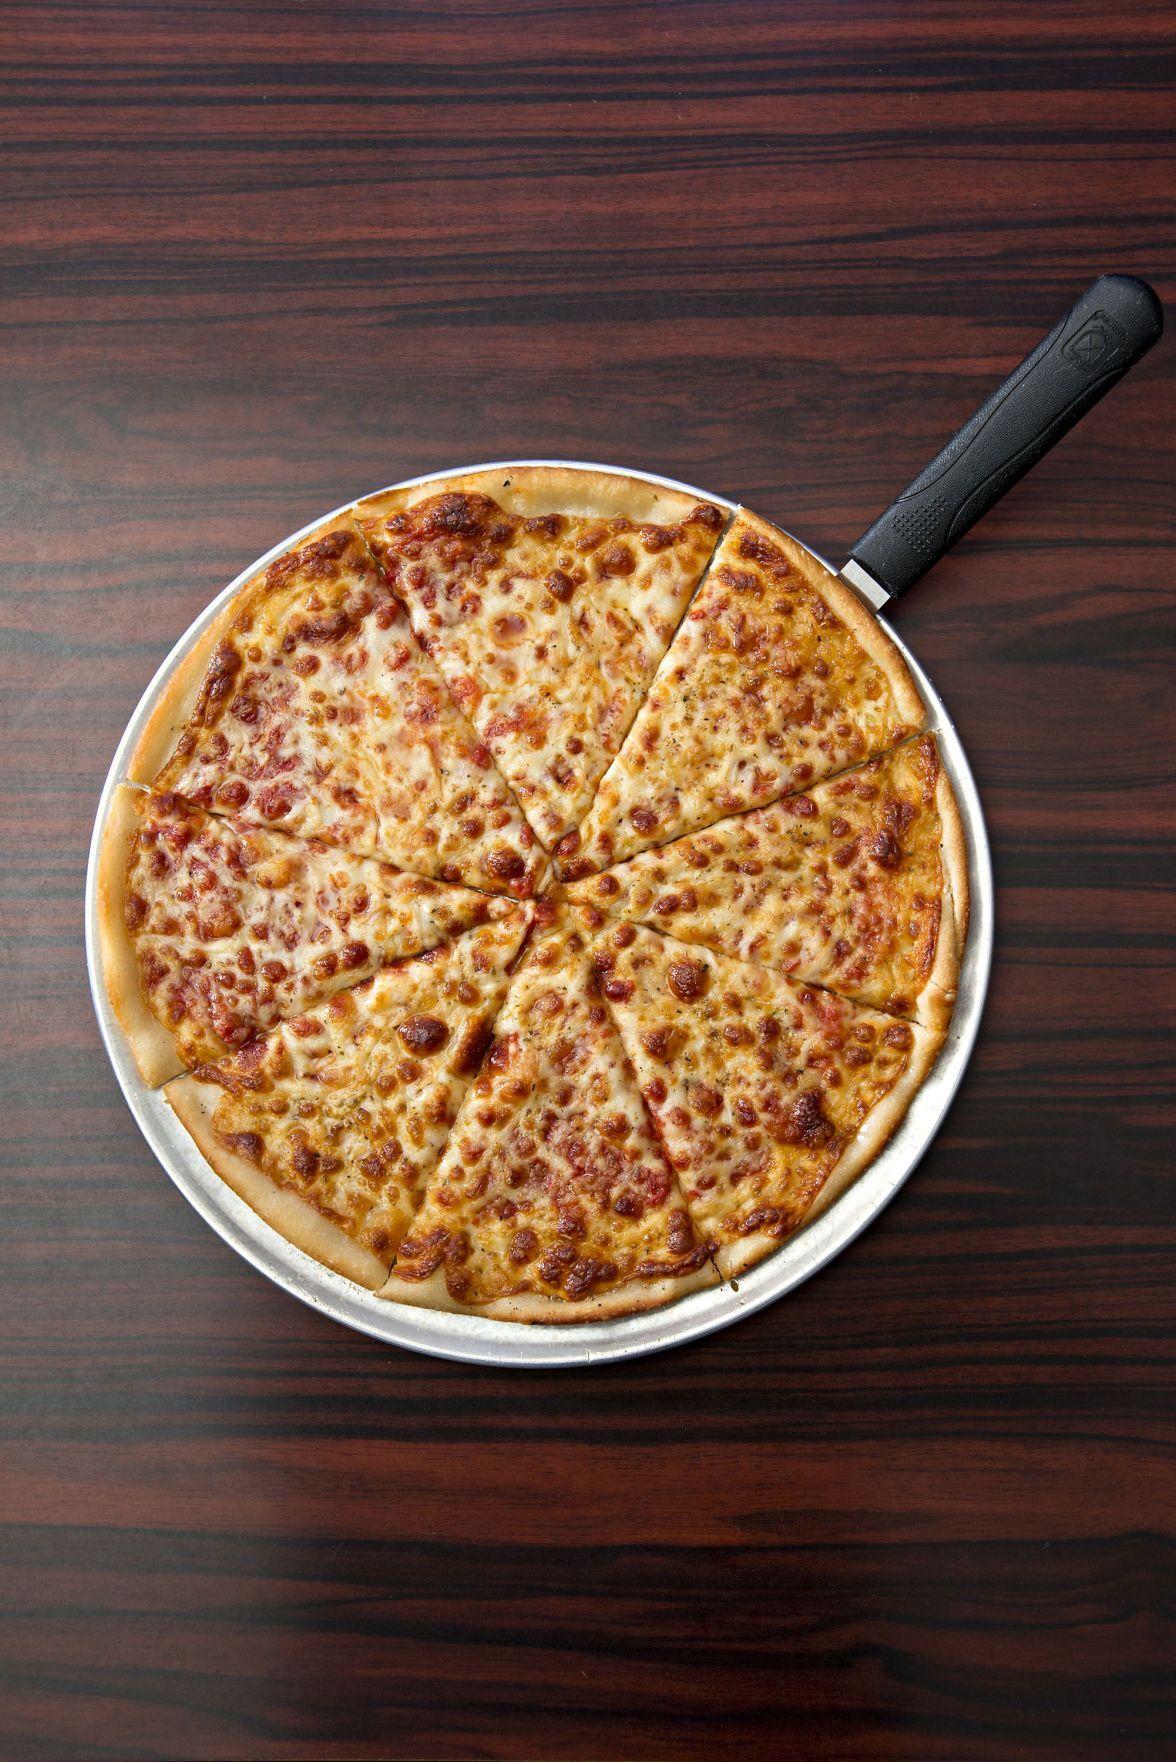 120117_flv_pizza